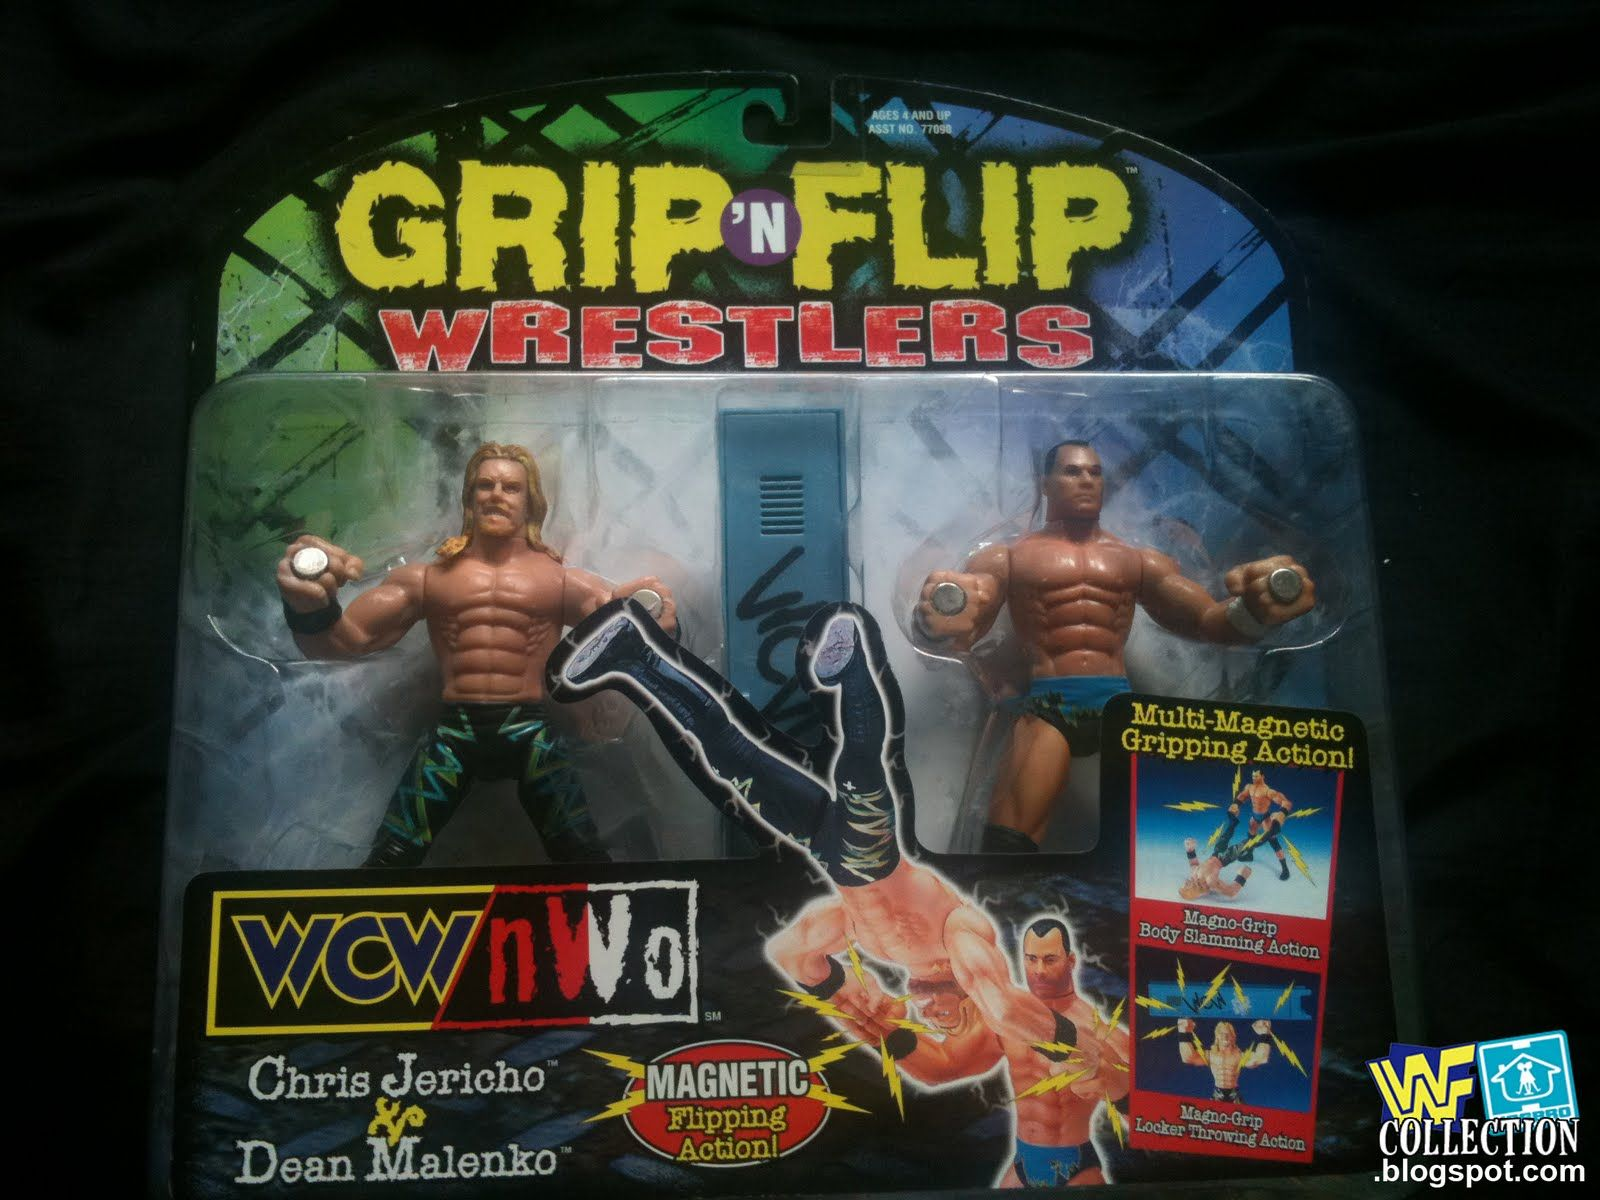 Grip & Flip Wrestlers - Chris Jericho and Dean Malenko | Dean ...